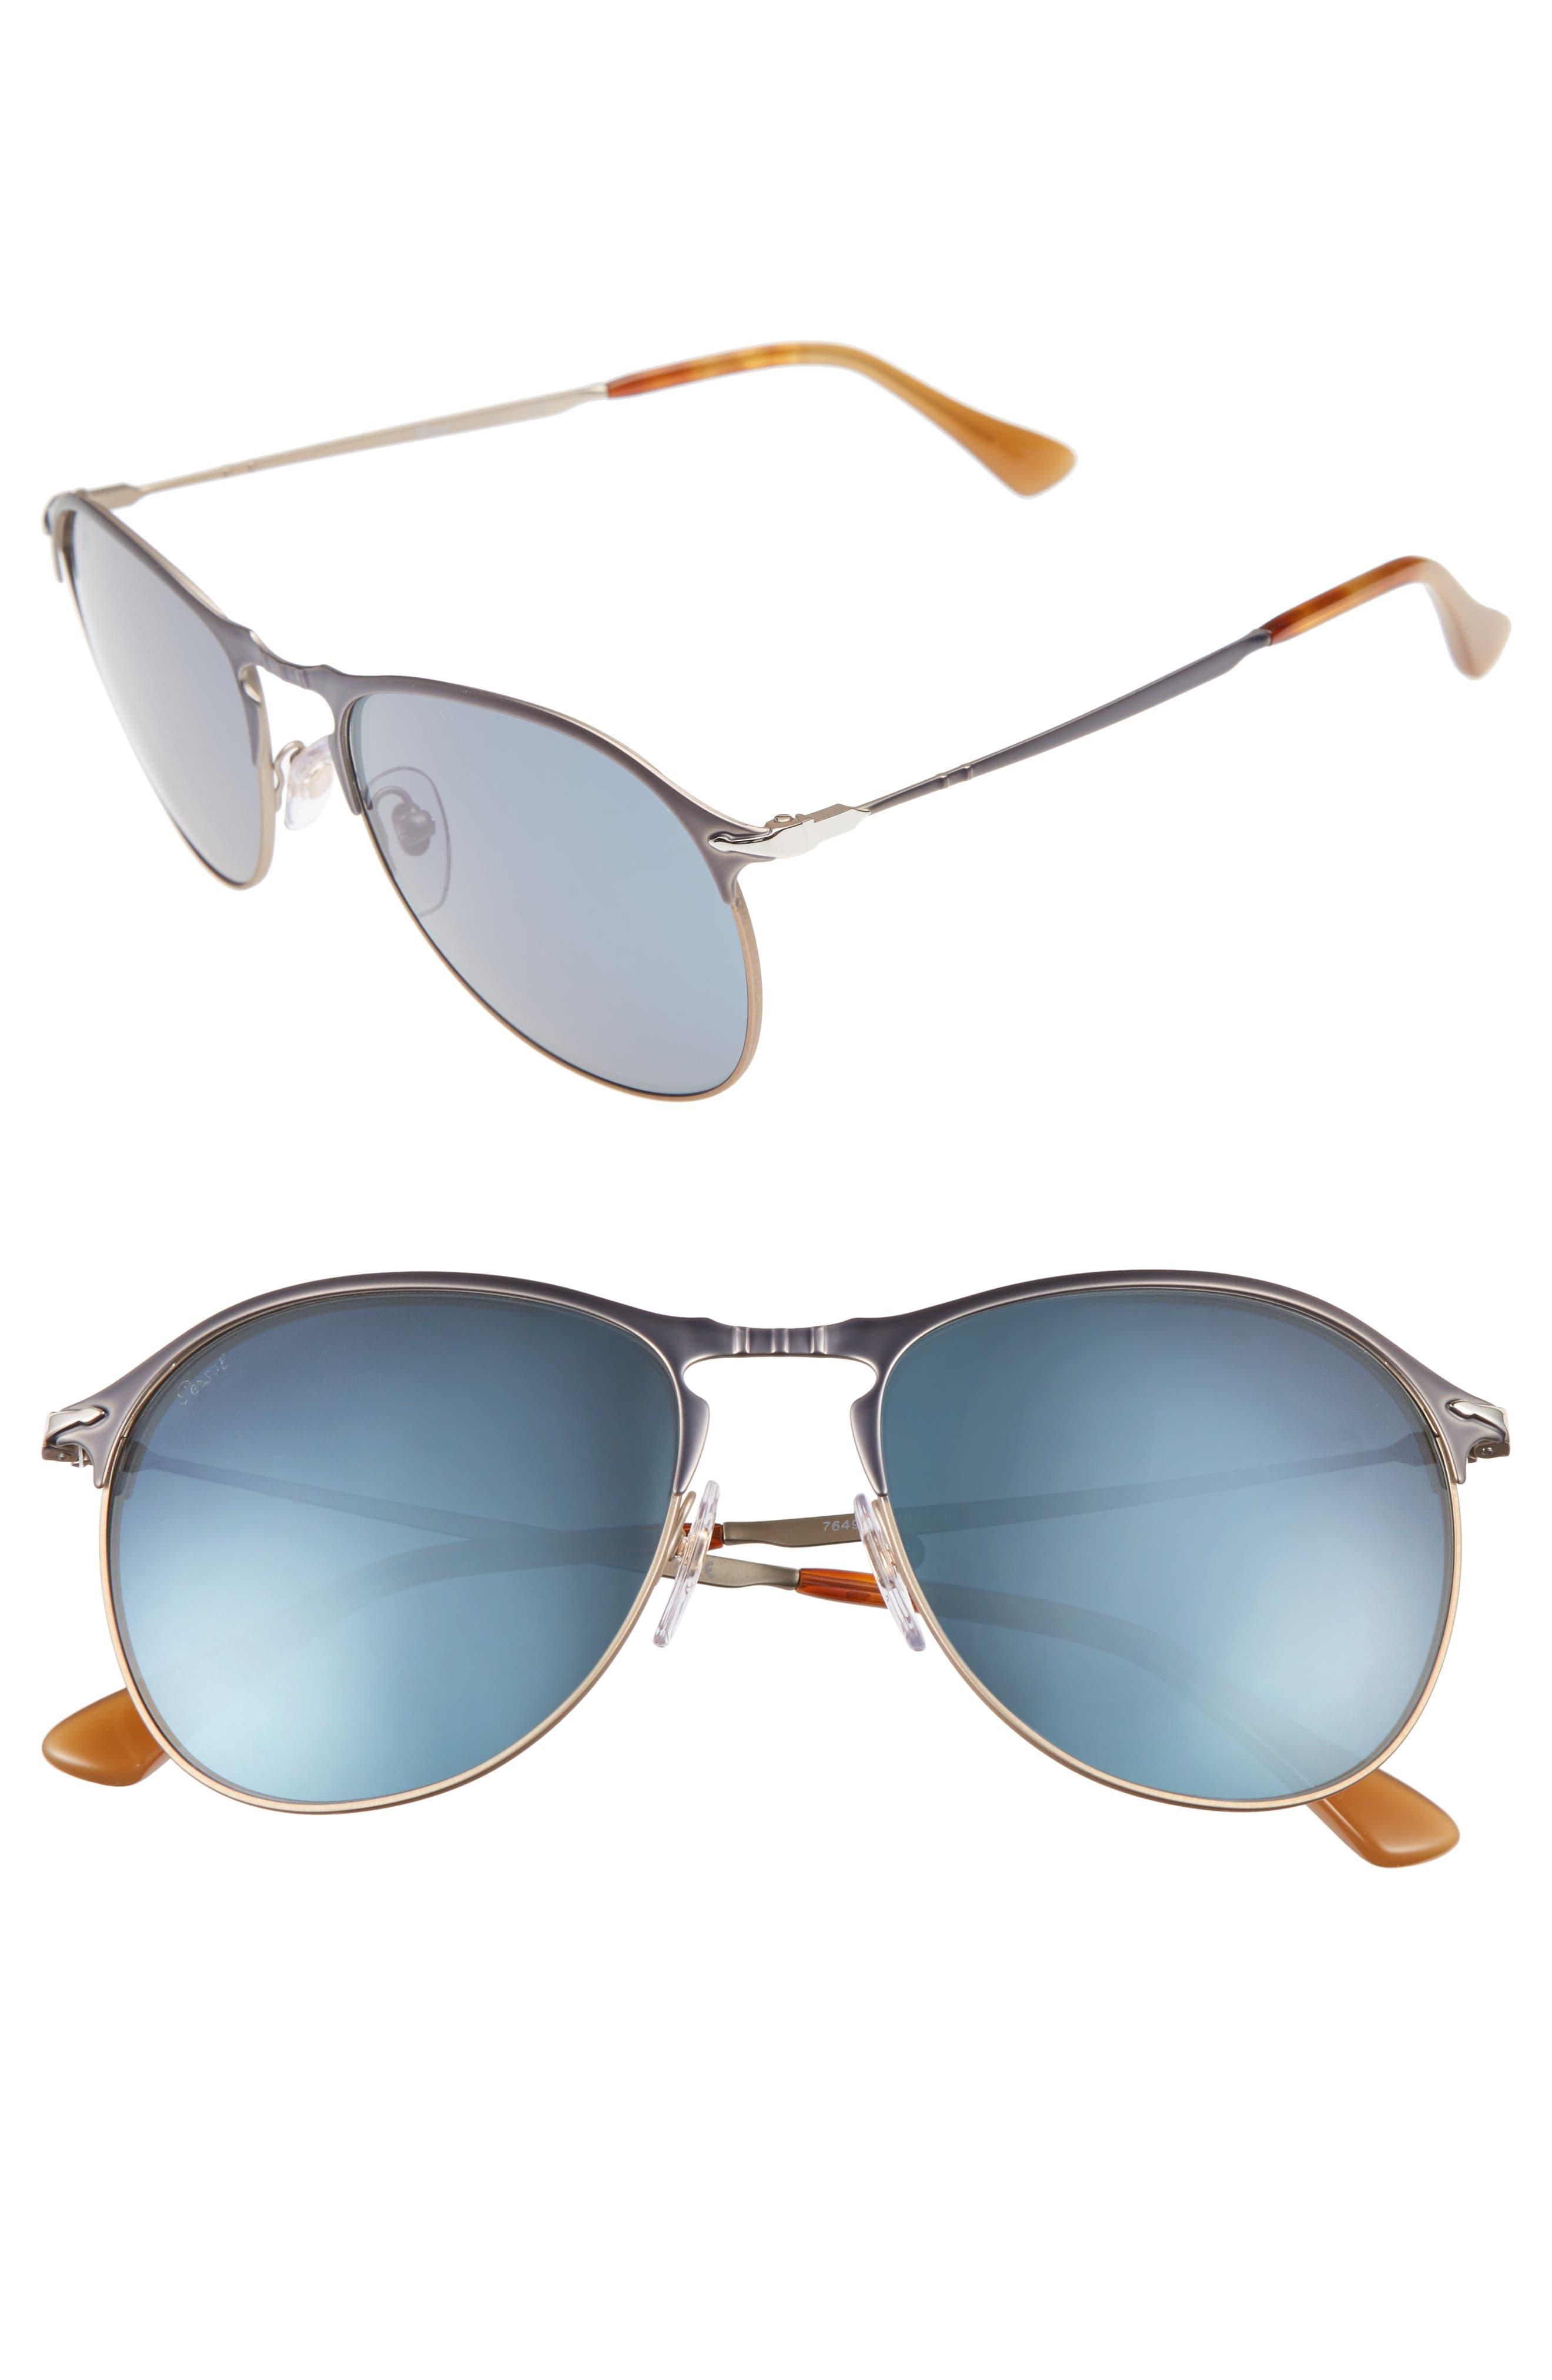 Sartoria 56m Aviator Sunglasses,                             Main thumbnail 1, color,